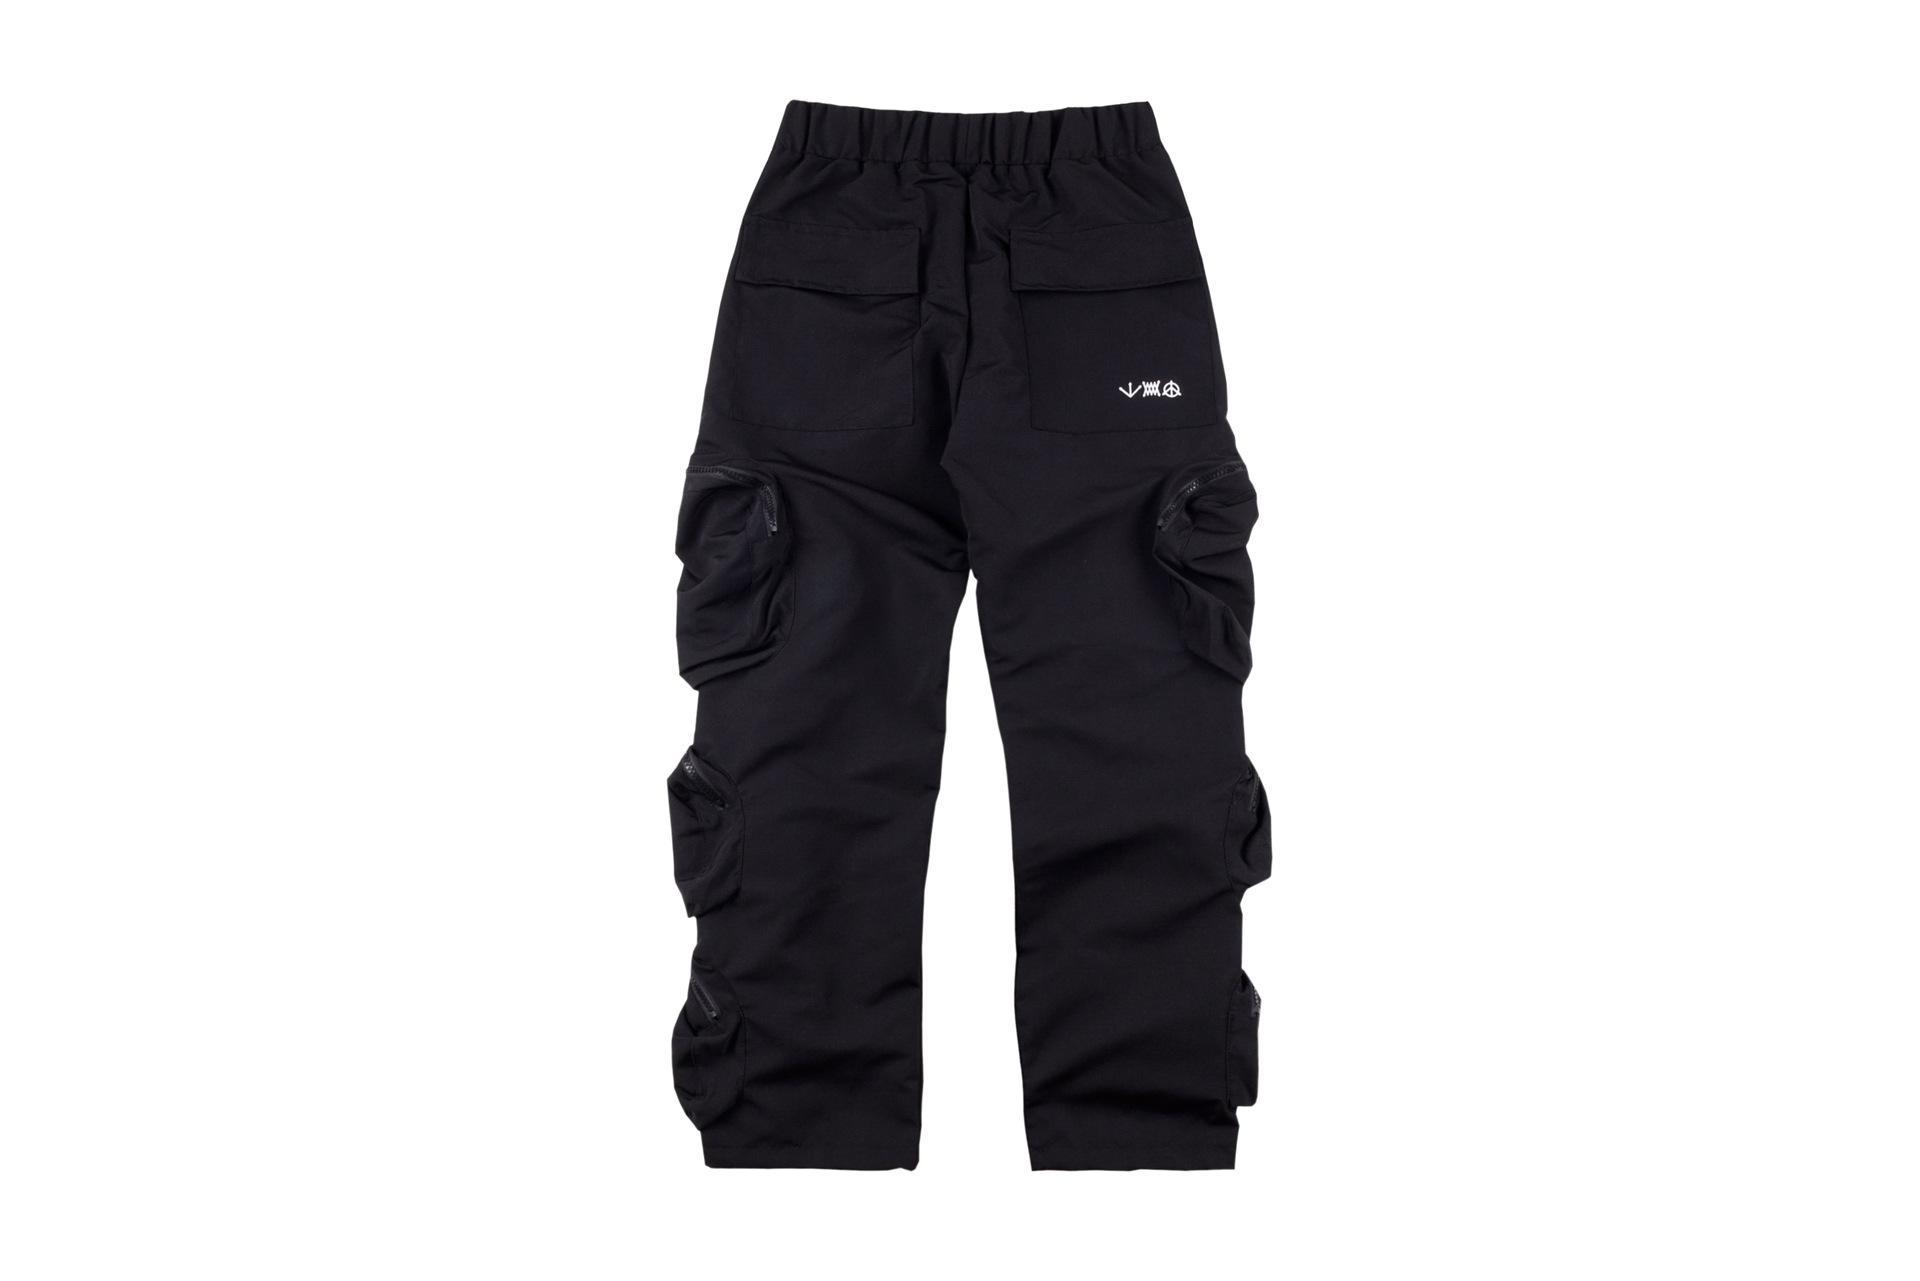 Erkek Tasarımcı Pantolon Travis Scott Poket Pantolon TS Tulum Çok Cep Rahat Pantolon Elastik Bel Retro Rahat Pantolon Moda Sweatpants